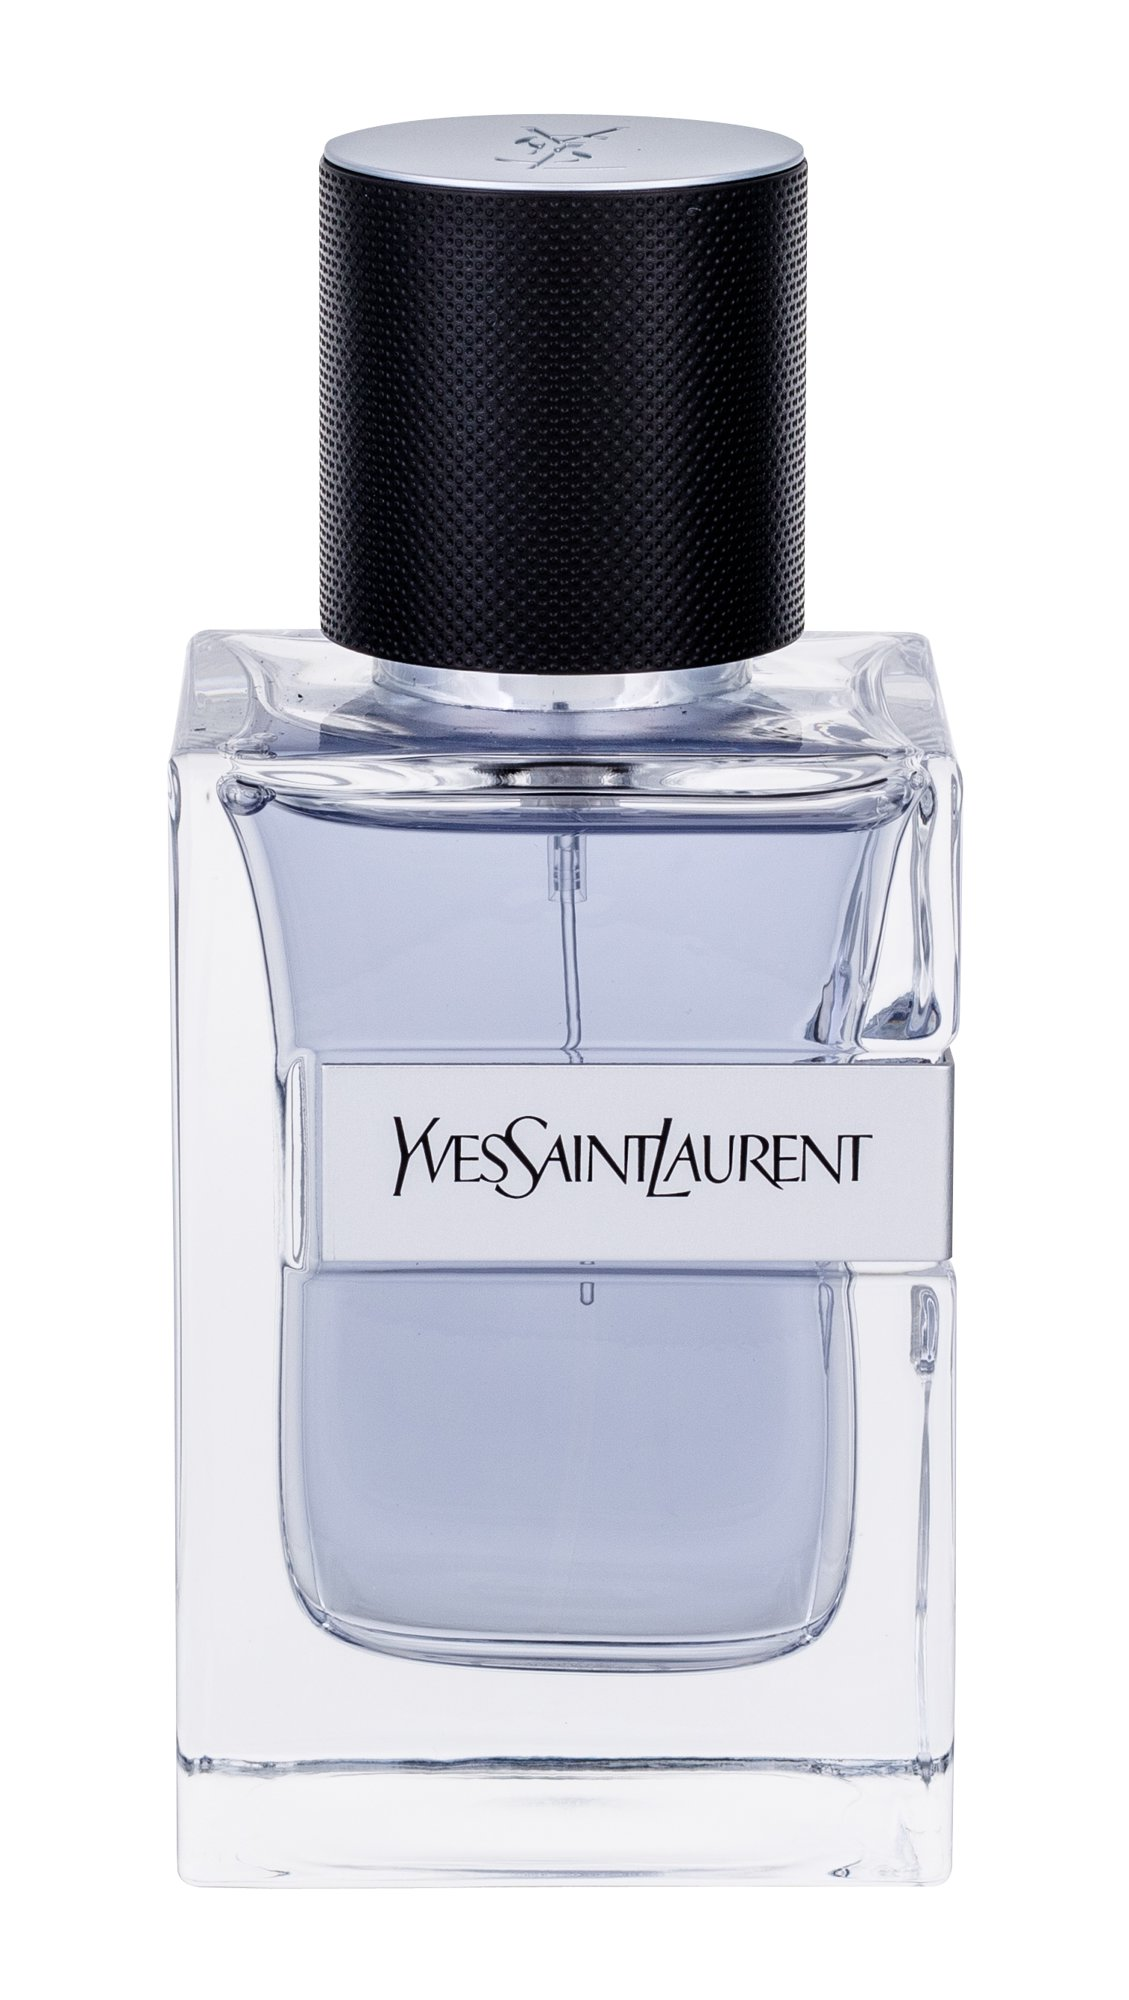 Yves Saint Laurent Y, Toaletní voda 60ml